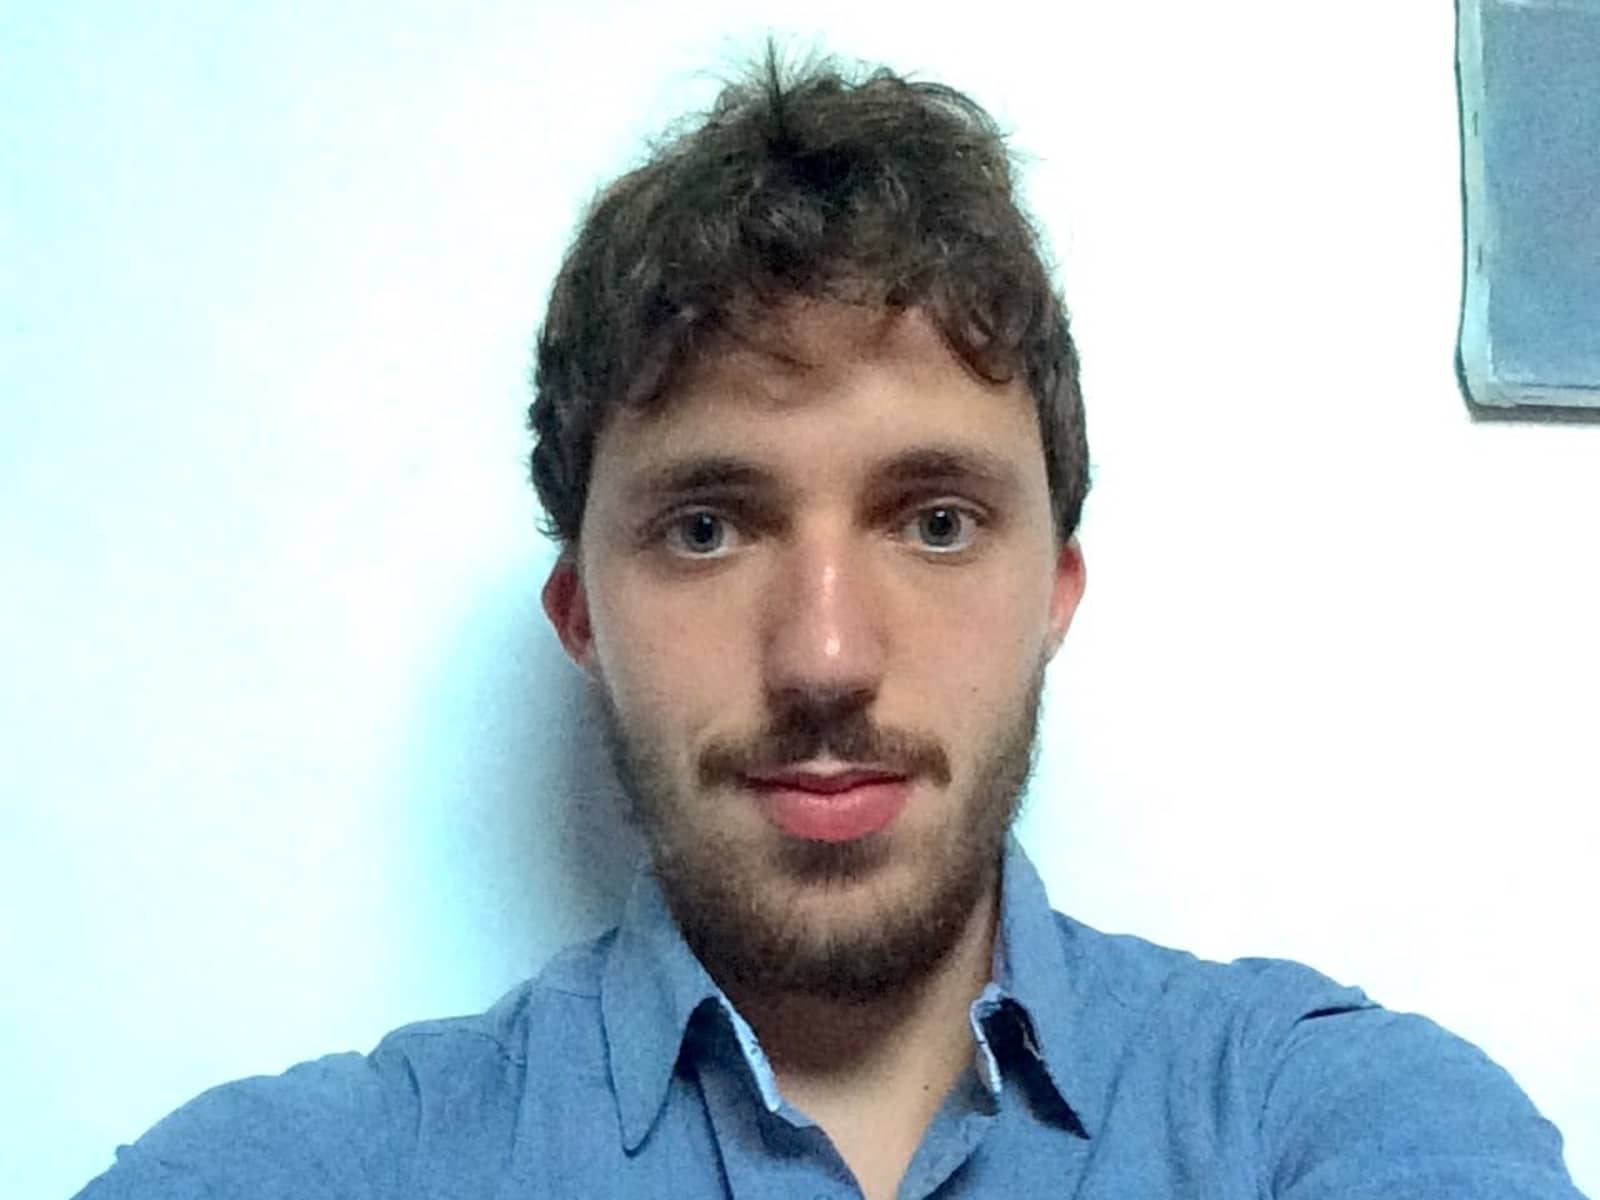 Niccolò from Nottingham, United Kingdom